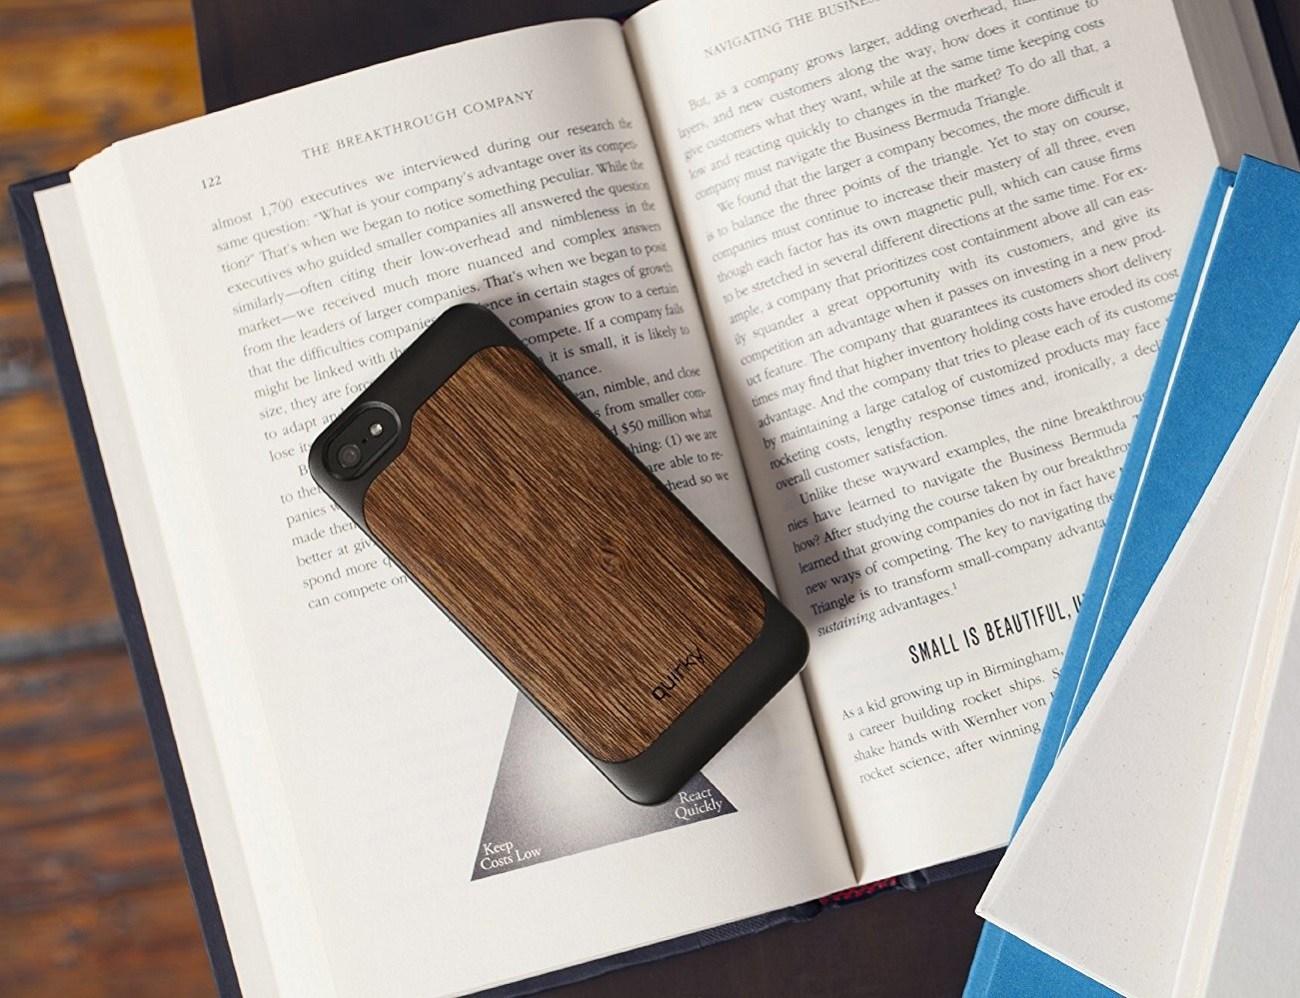 Pli Wood Case For iPhone SE/5s